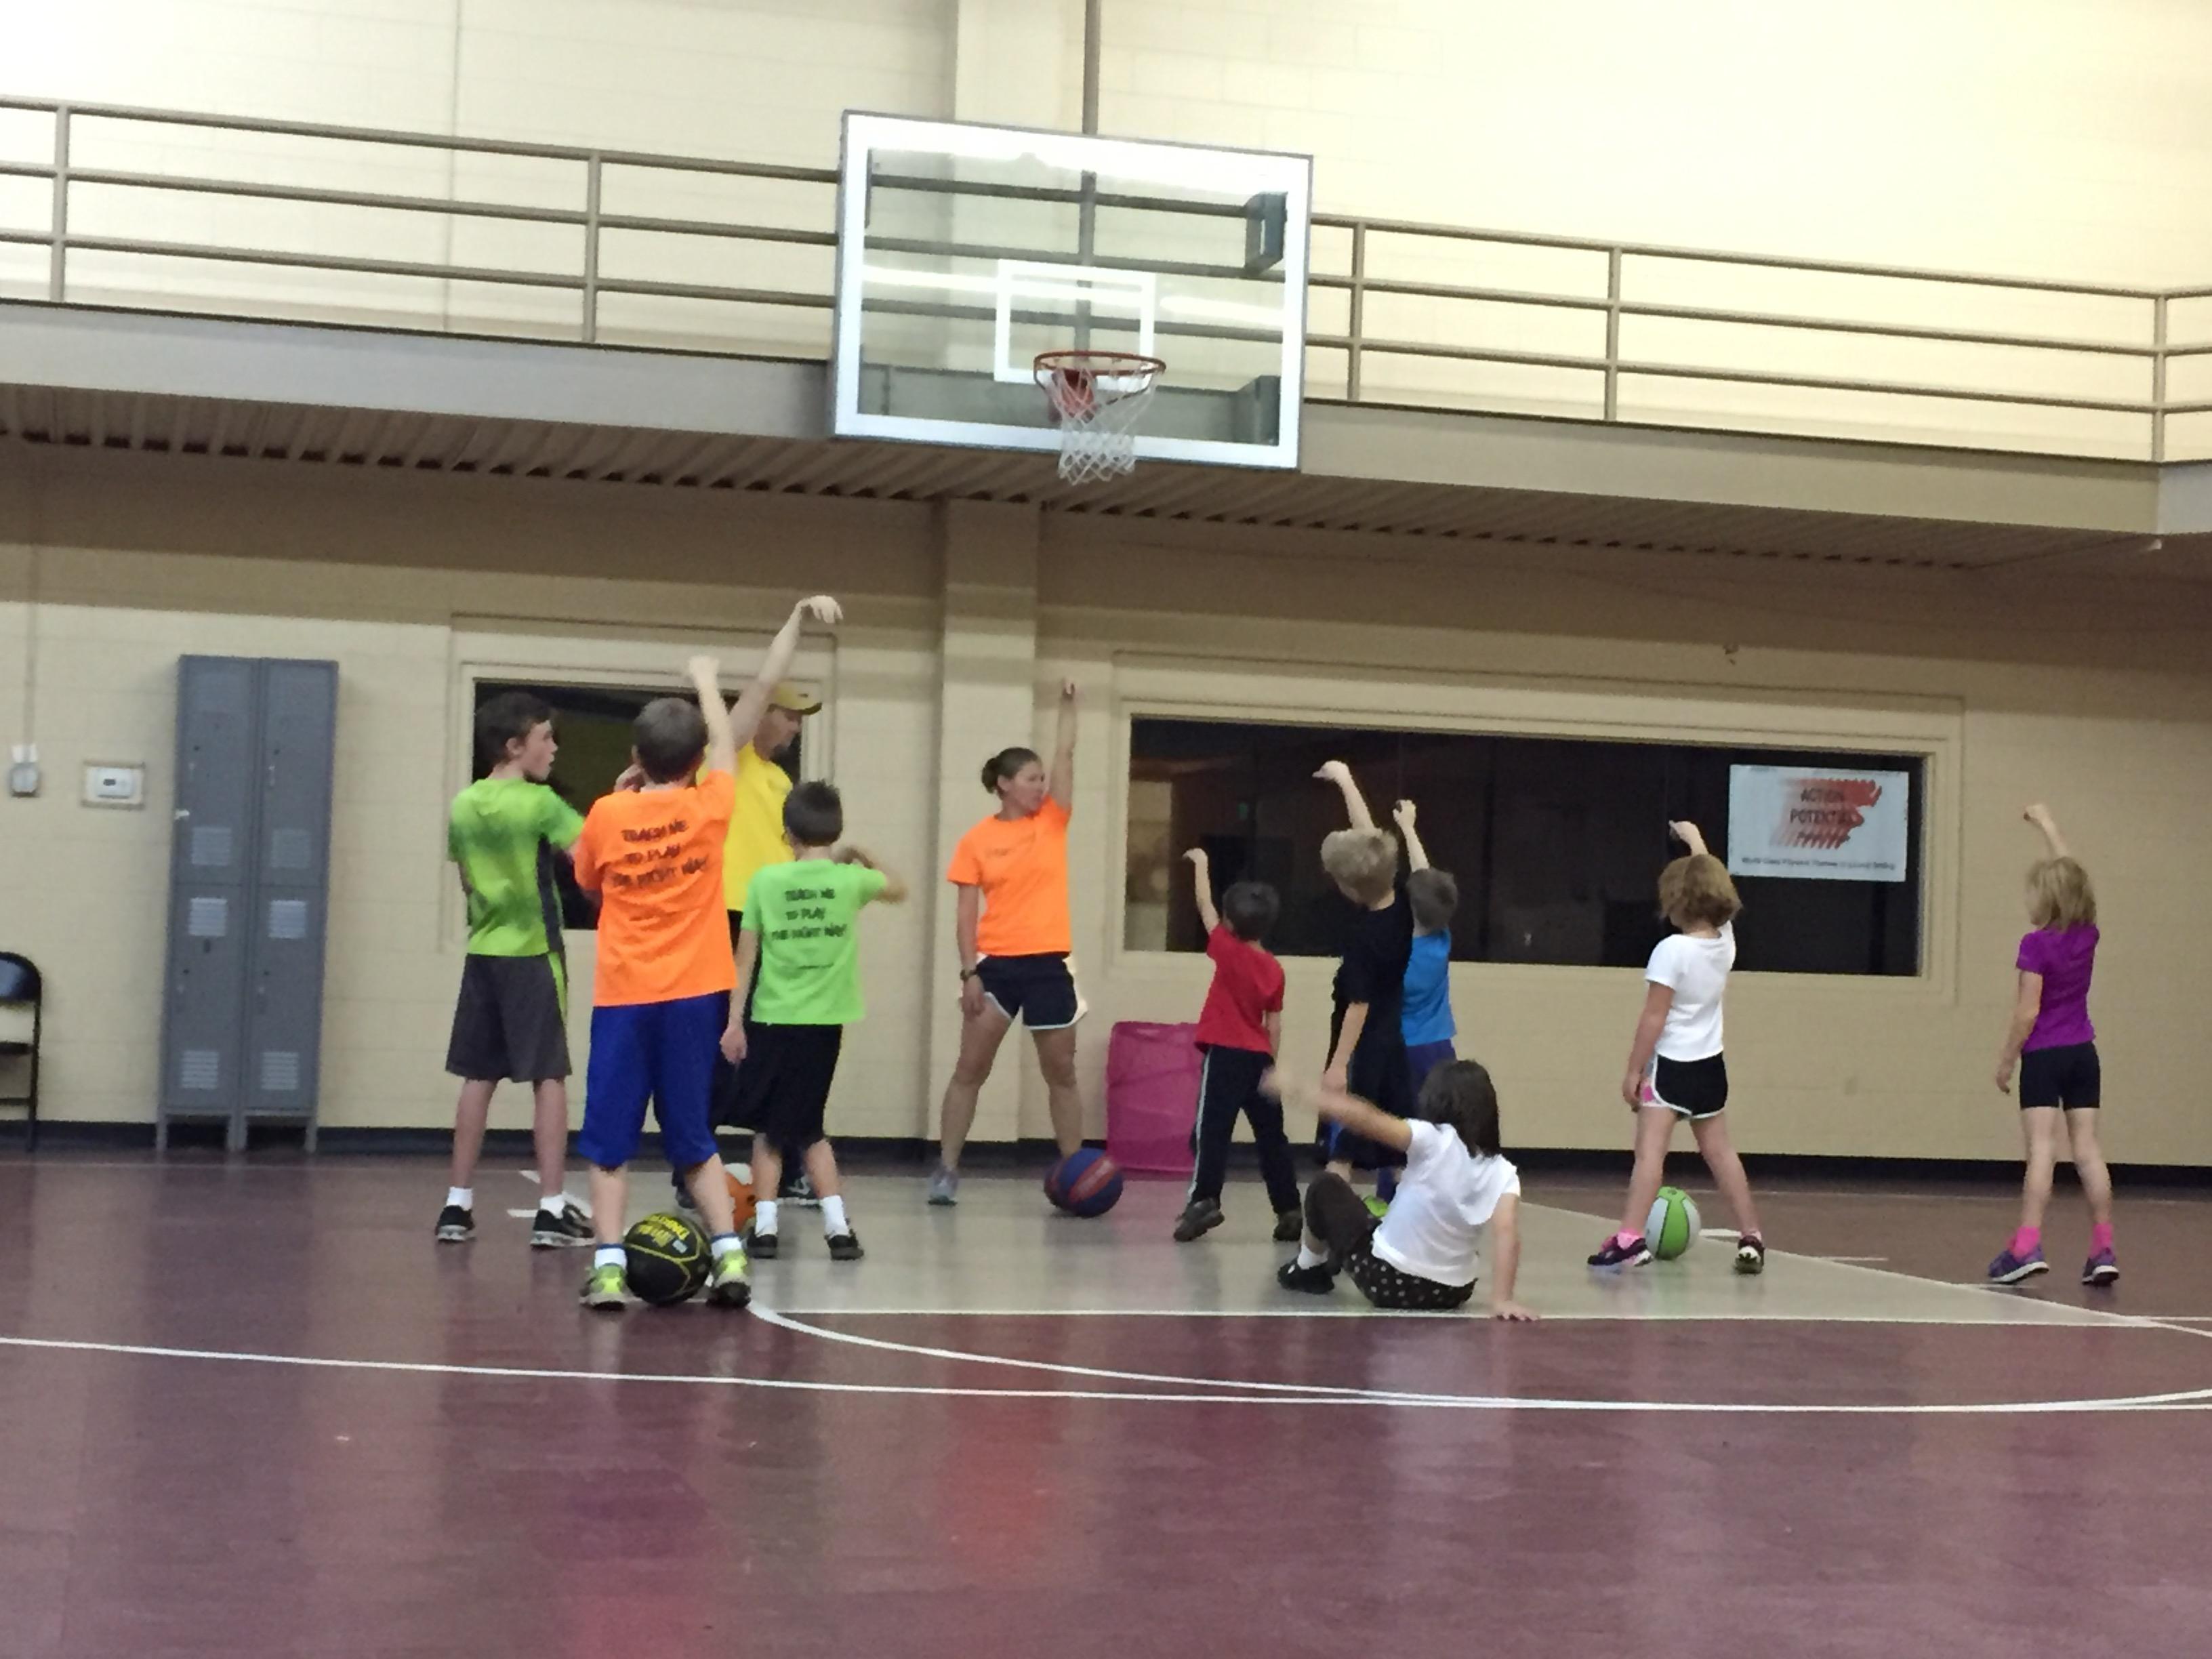 Basketball form and fundamentals